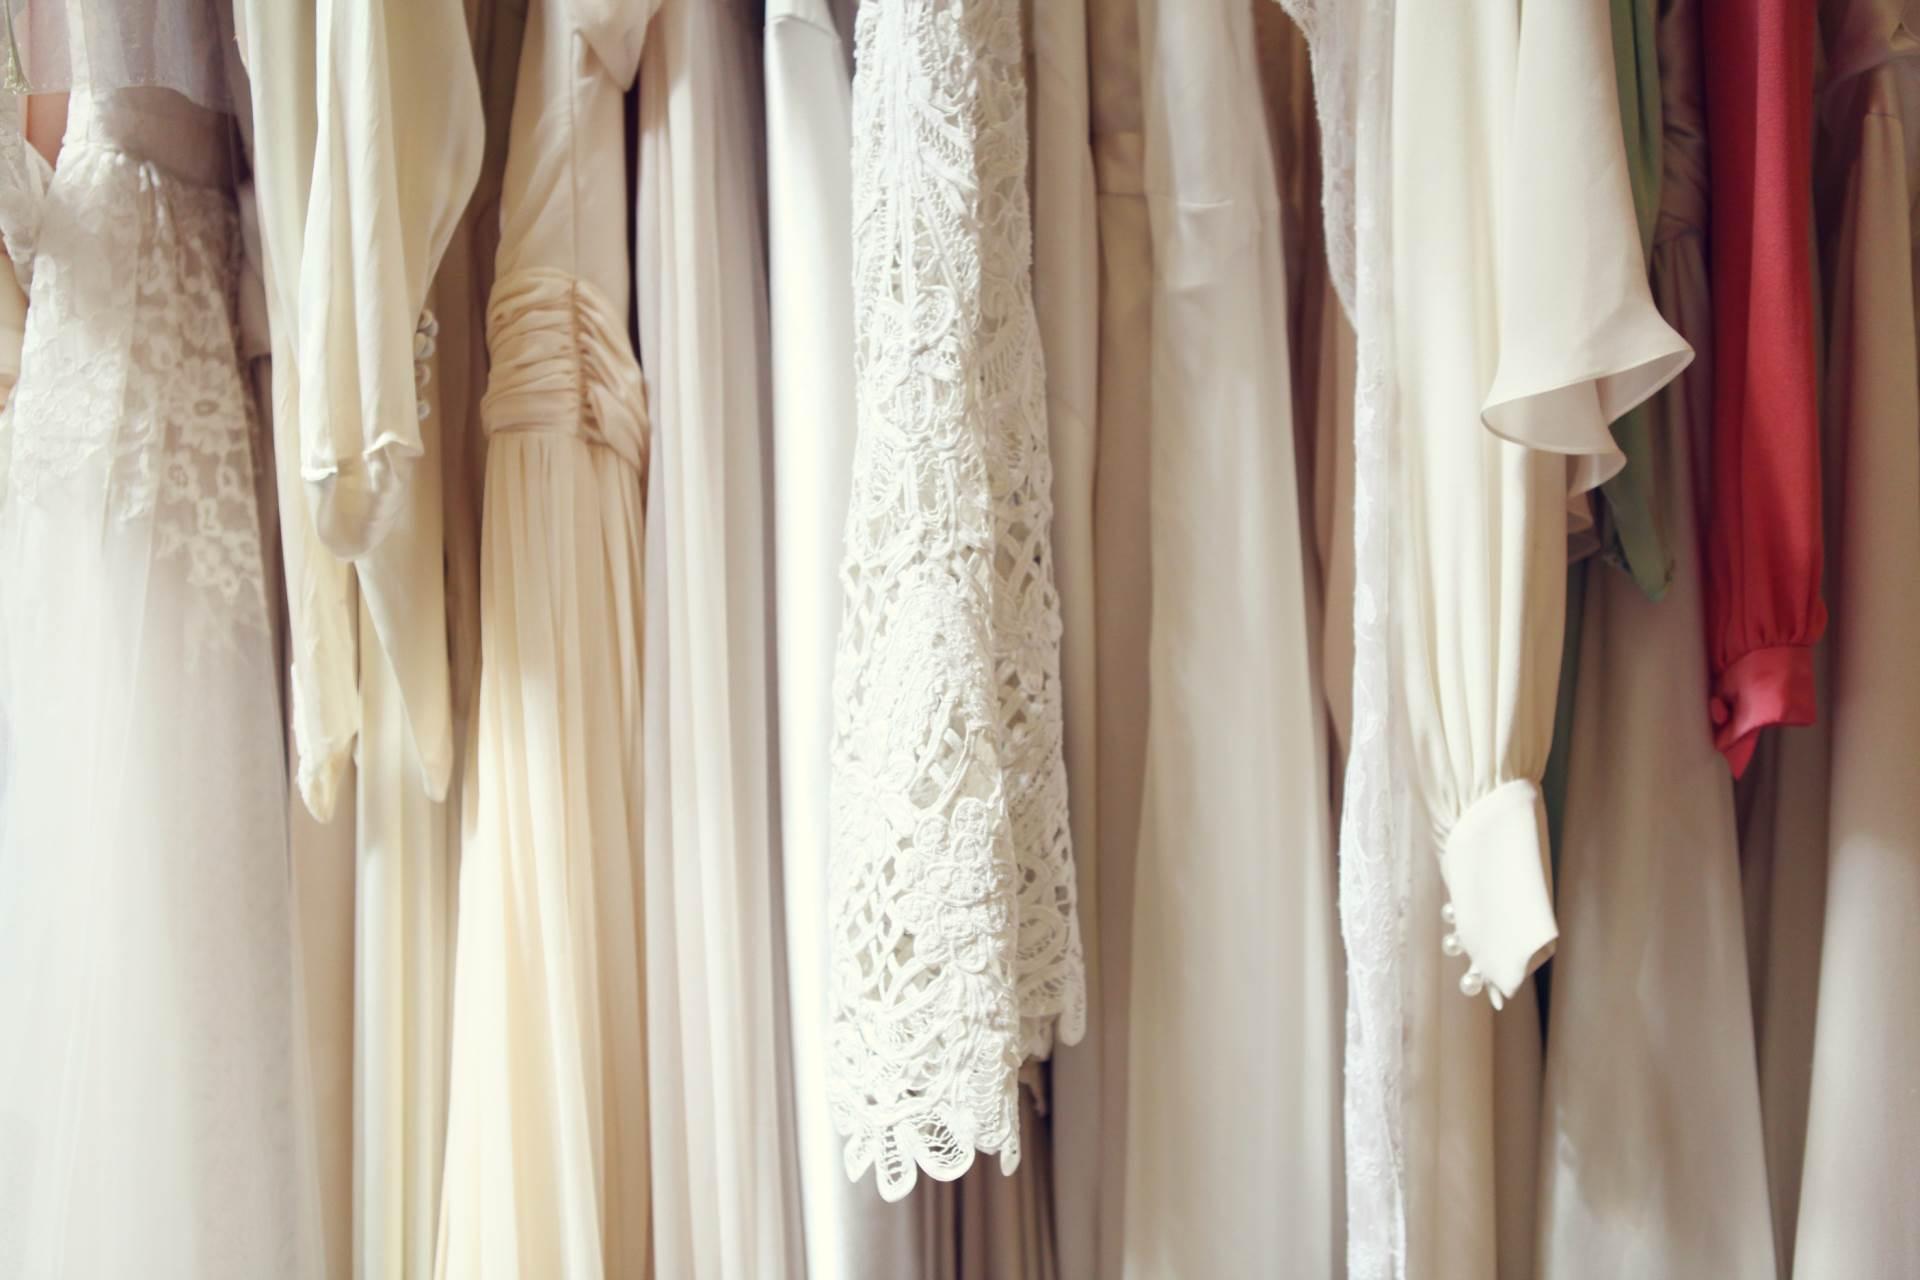 6 steps to choosing your vintage wedding dress